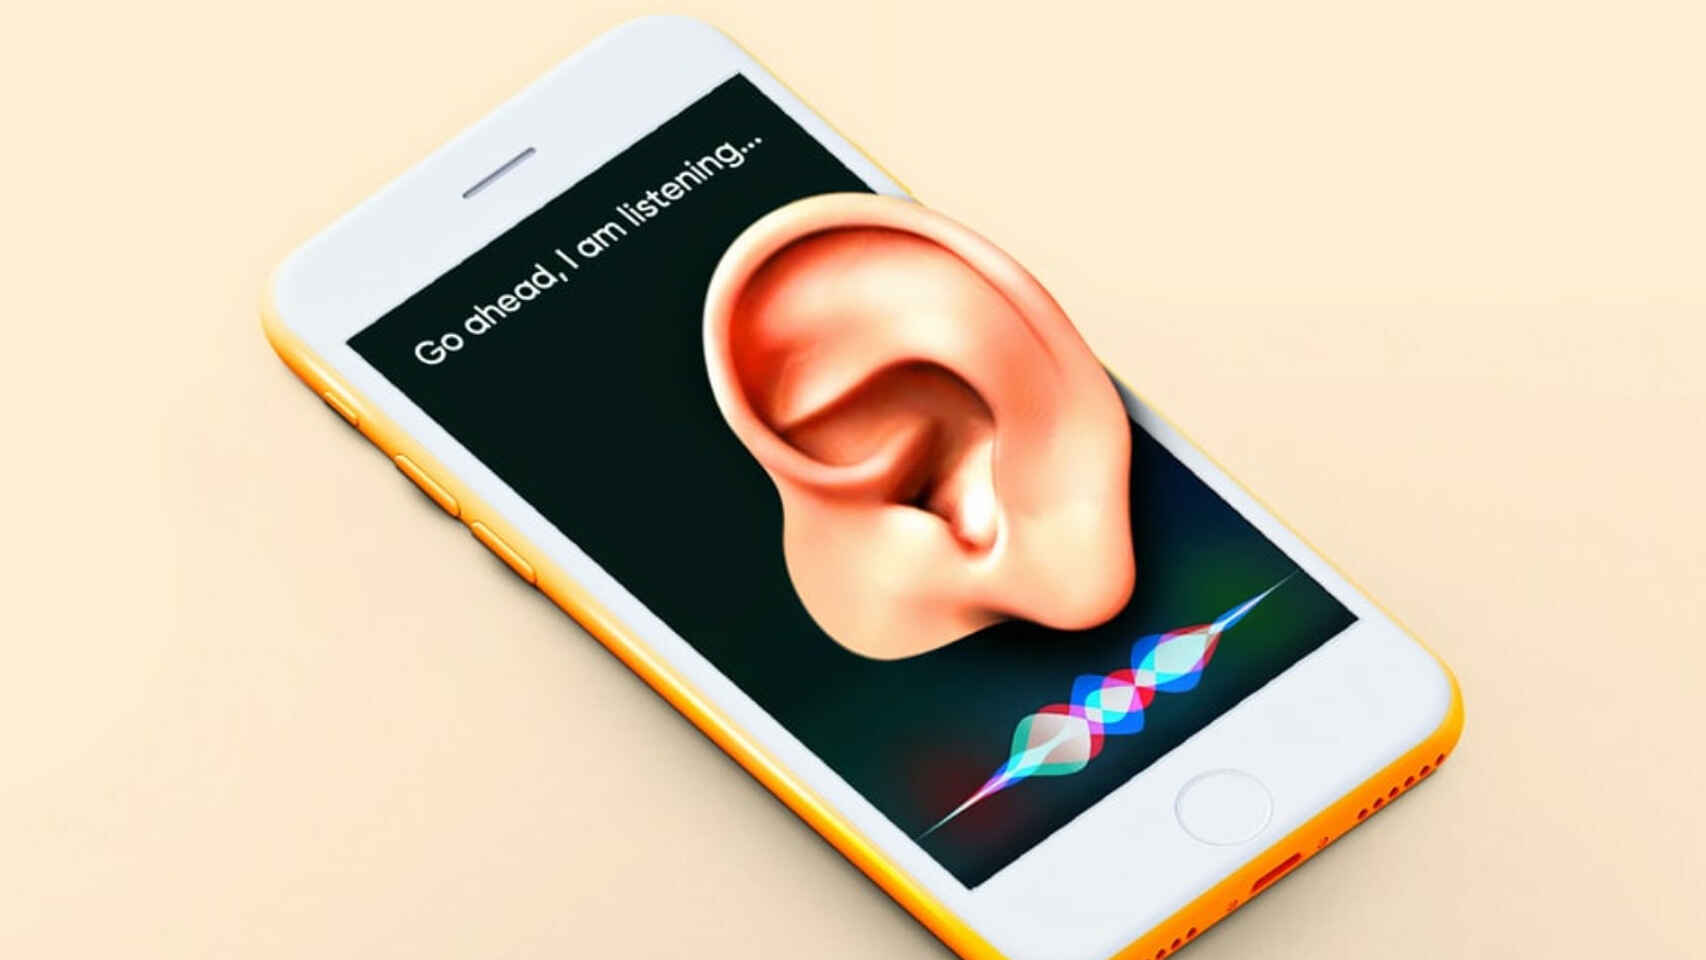 Siri en un iPhone.